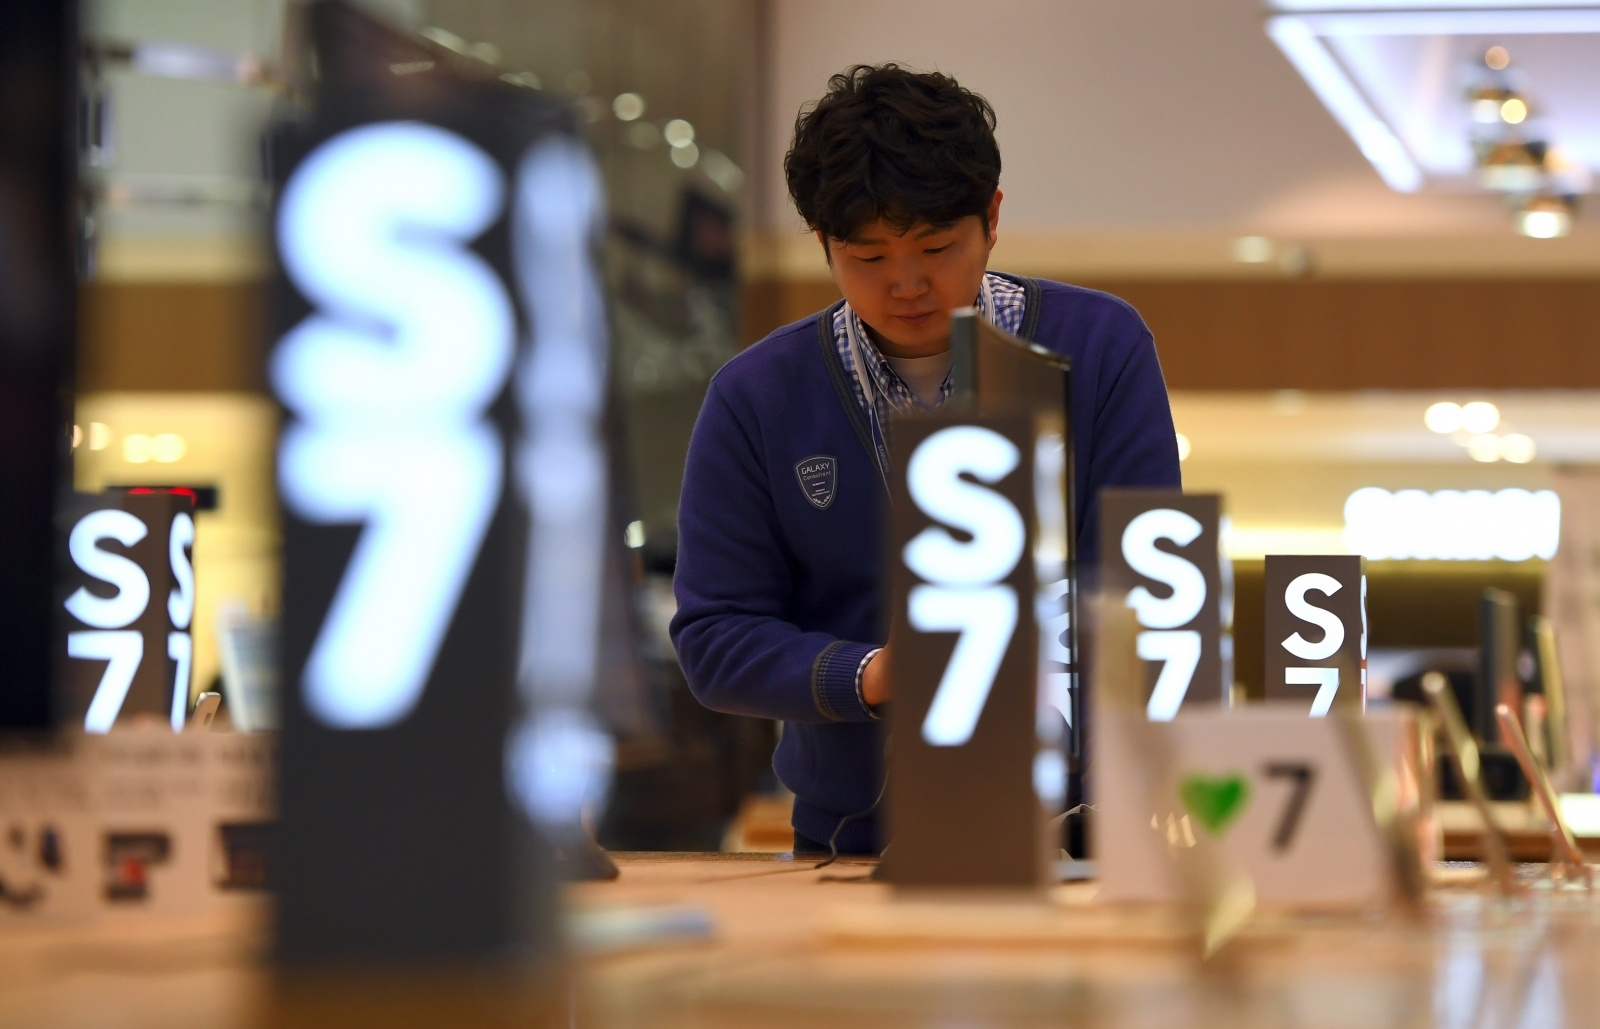 Galaxy S7, S7 Edge stability improvement update